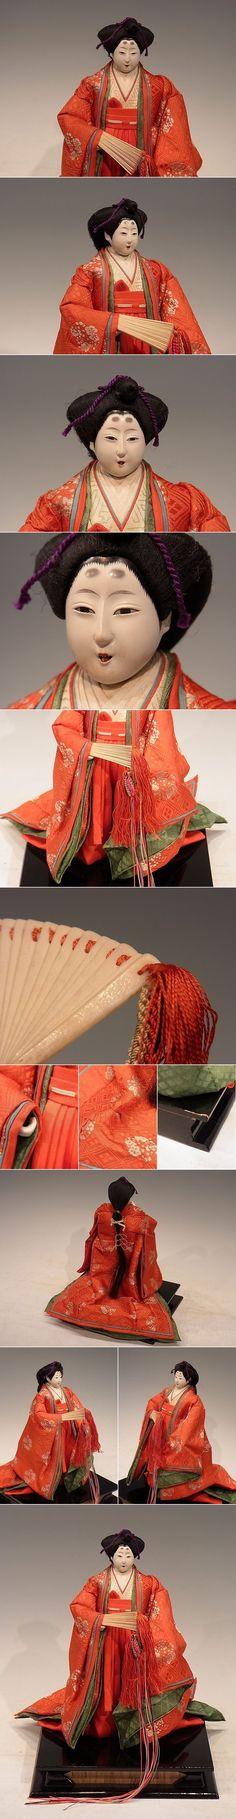 hina doll #heian #heiankyo #junihitoe